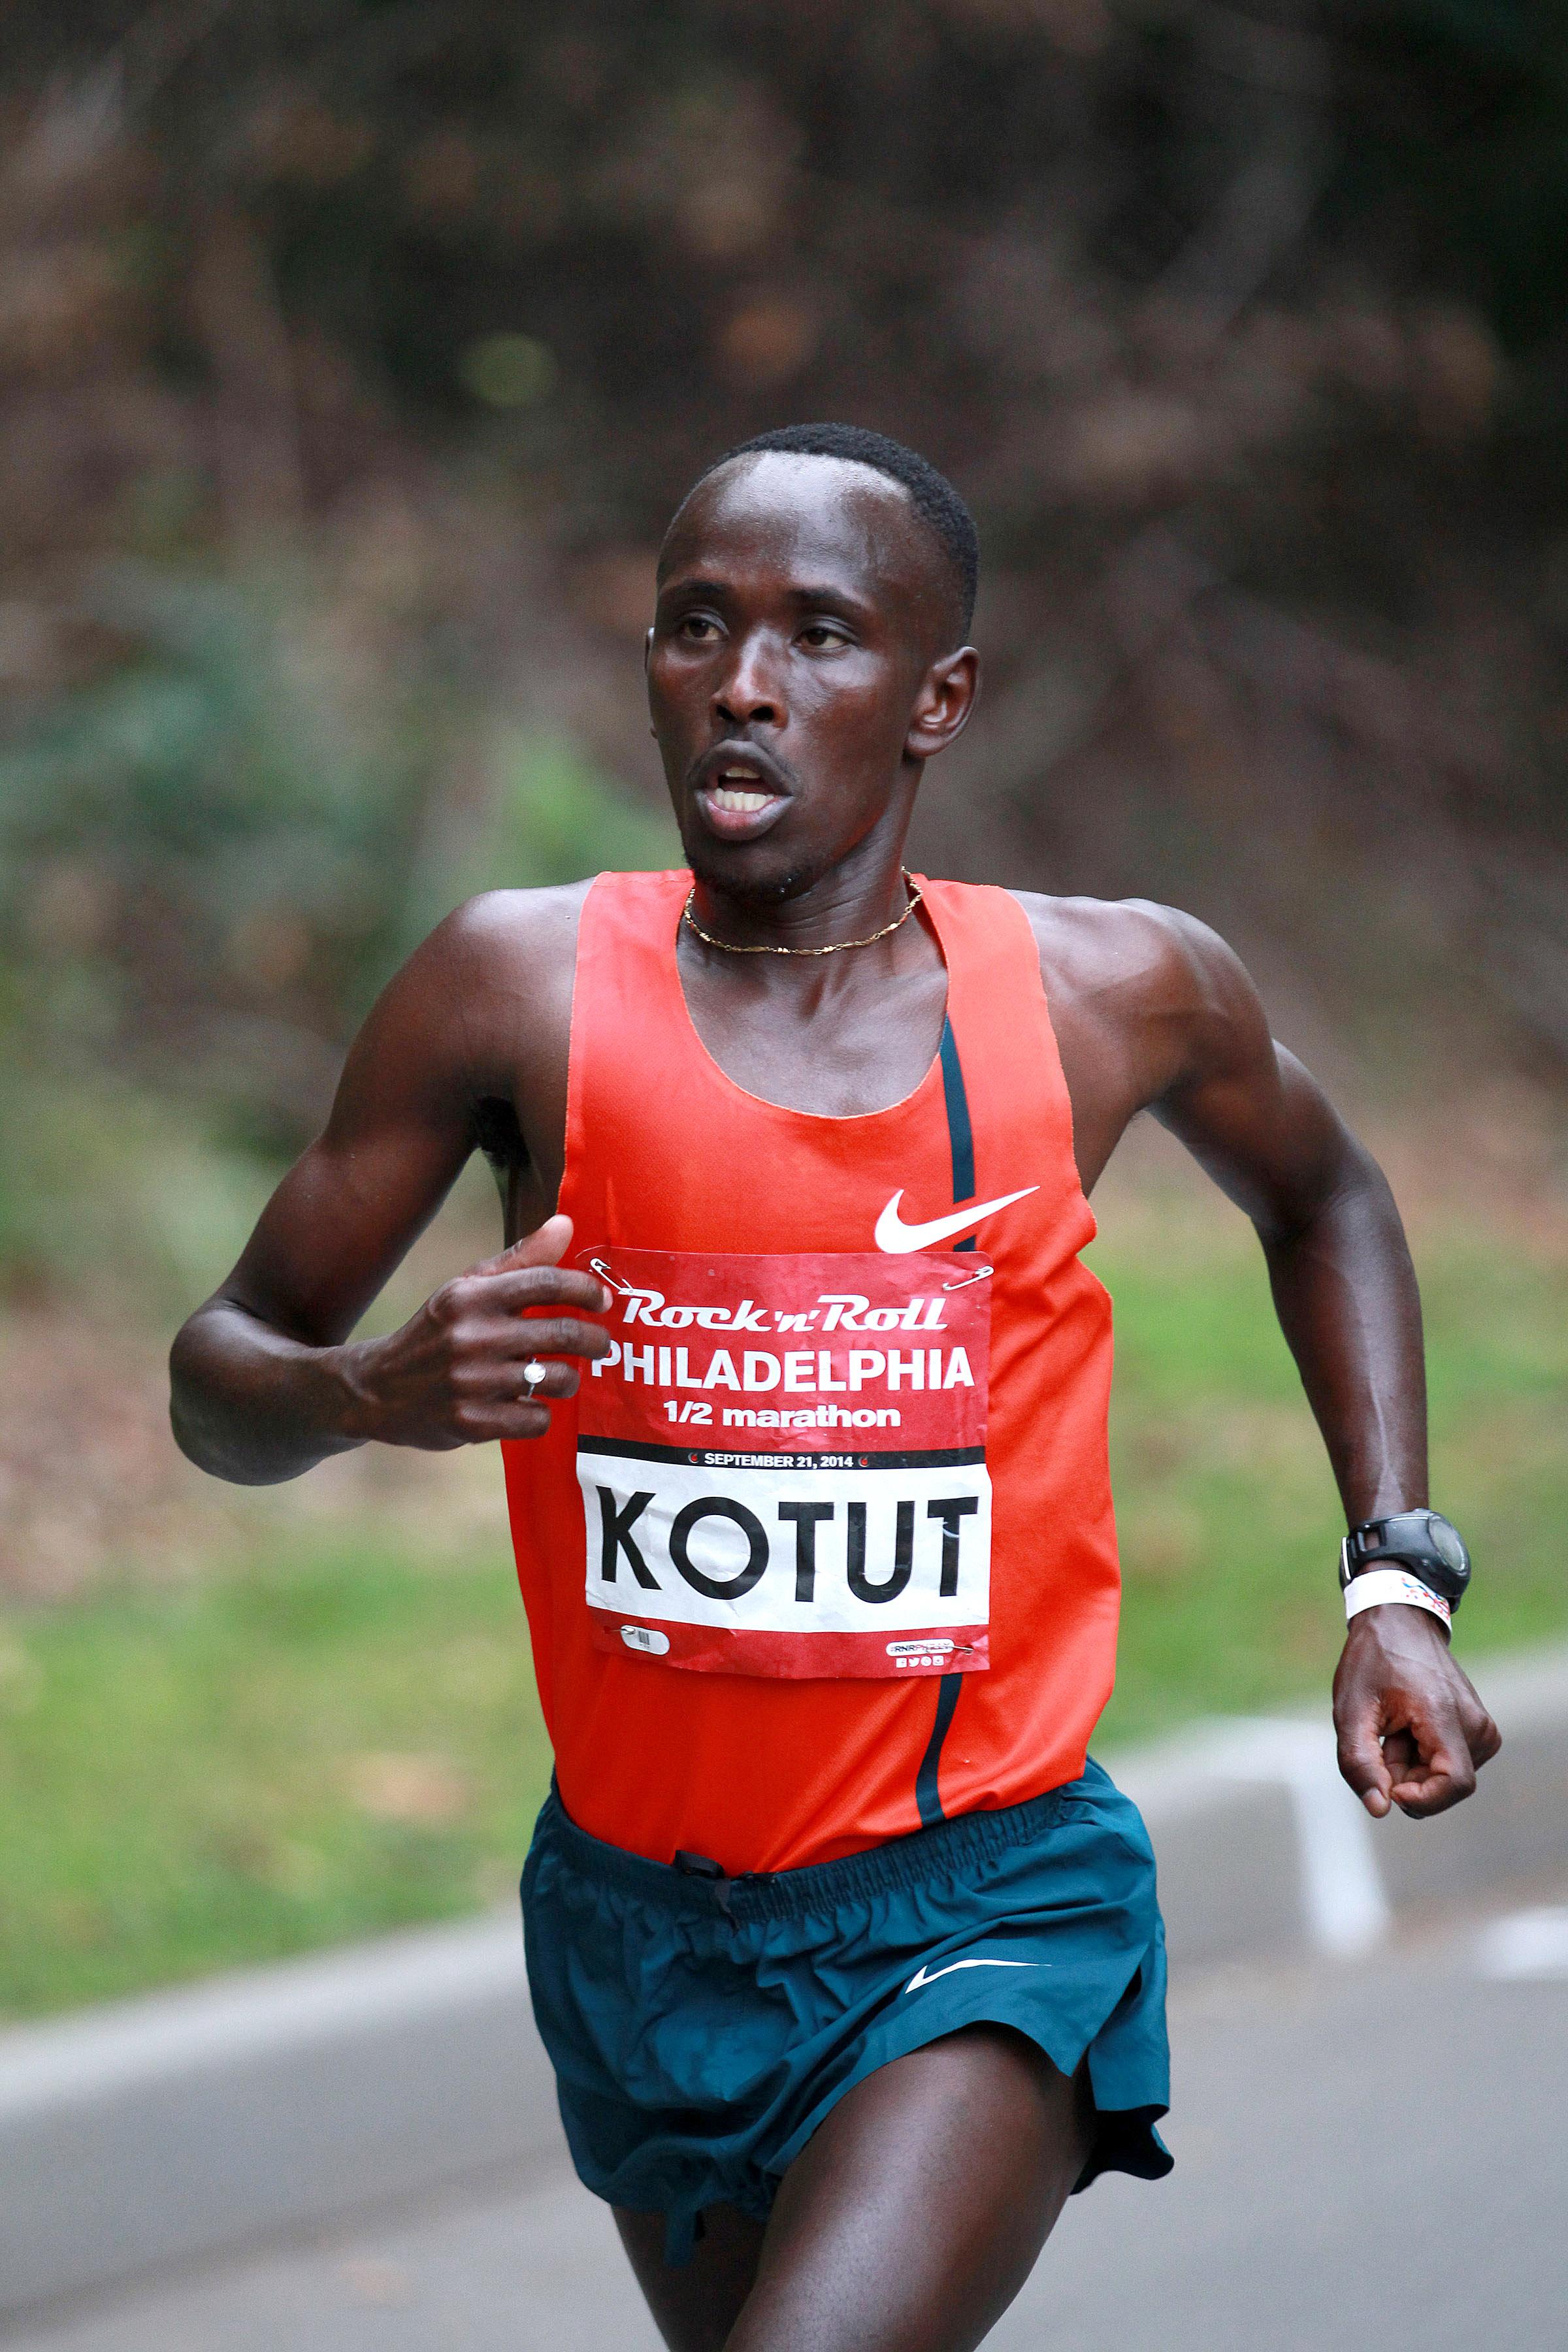 https://www.frankfurt-marathon.com/wp-content/uploads/Frankfurt-Marathon_Marathon-News_Cybrian-Kotut_-5998.jpg